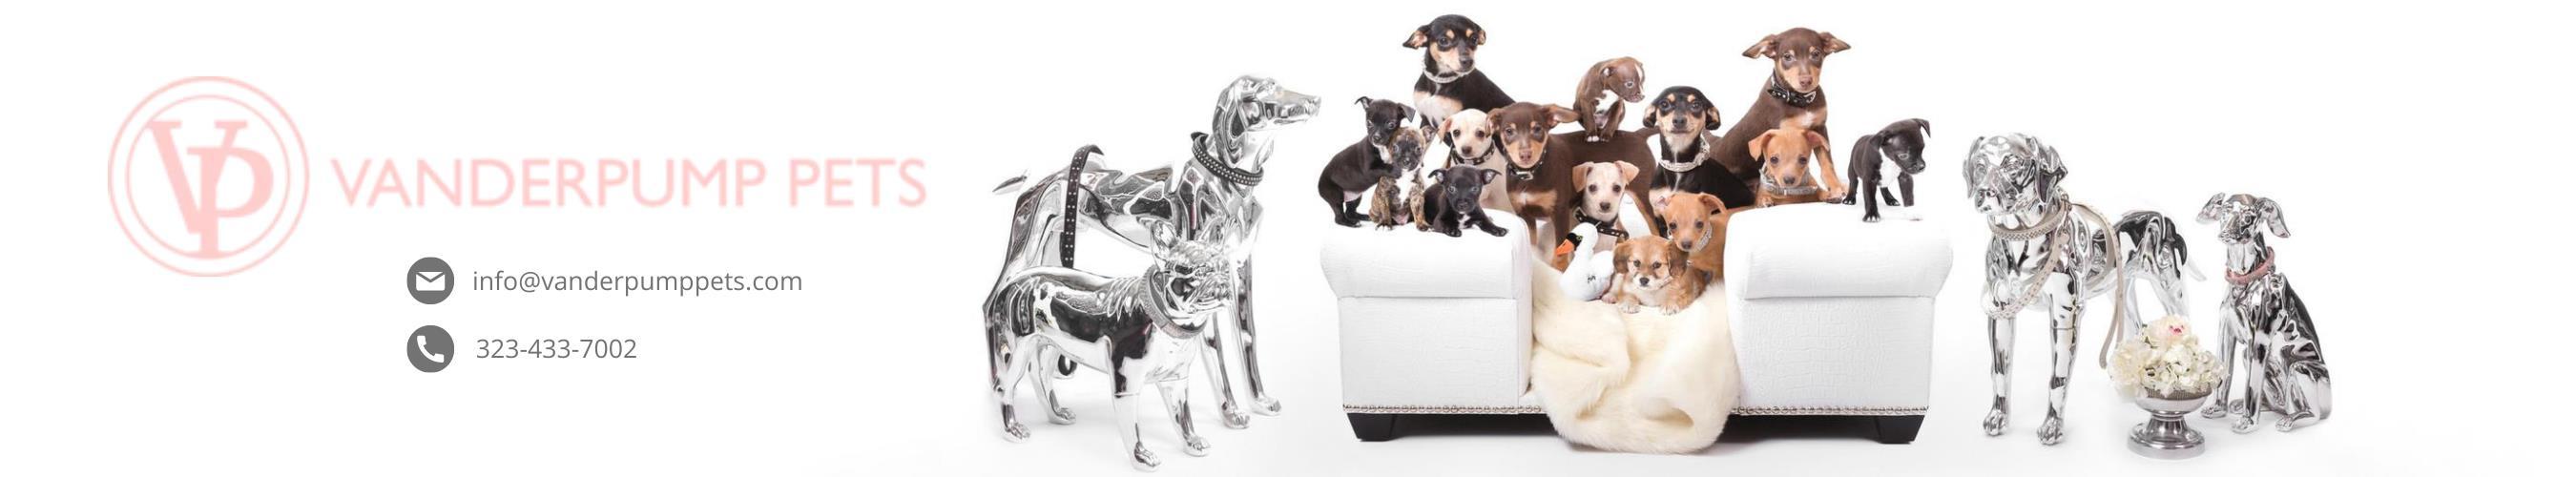 Vanderpump Pets LLC